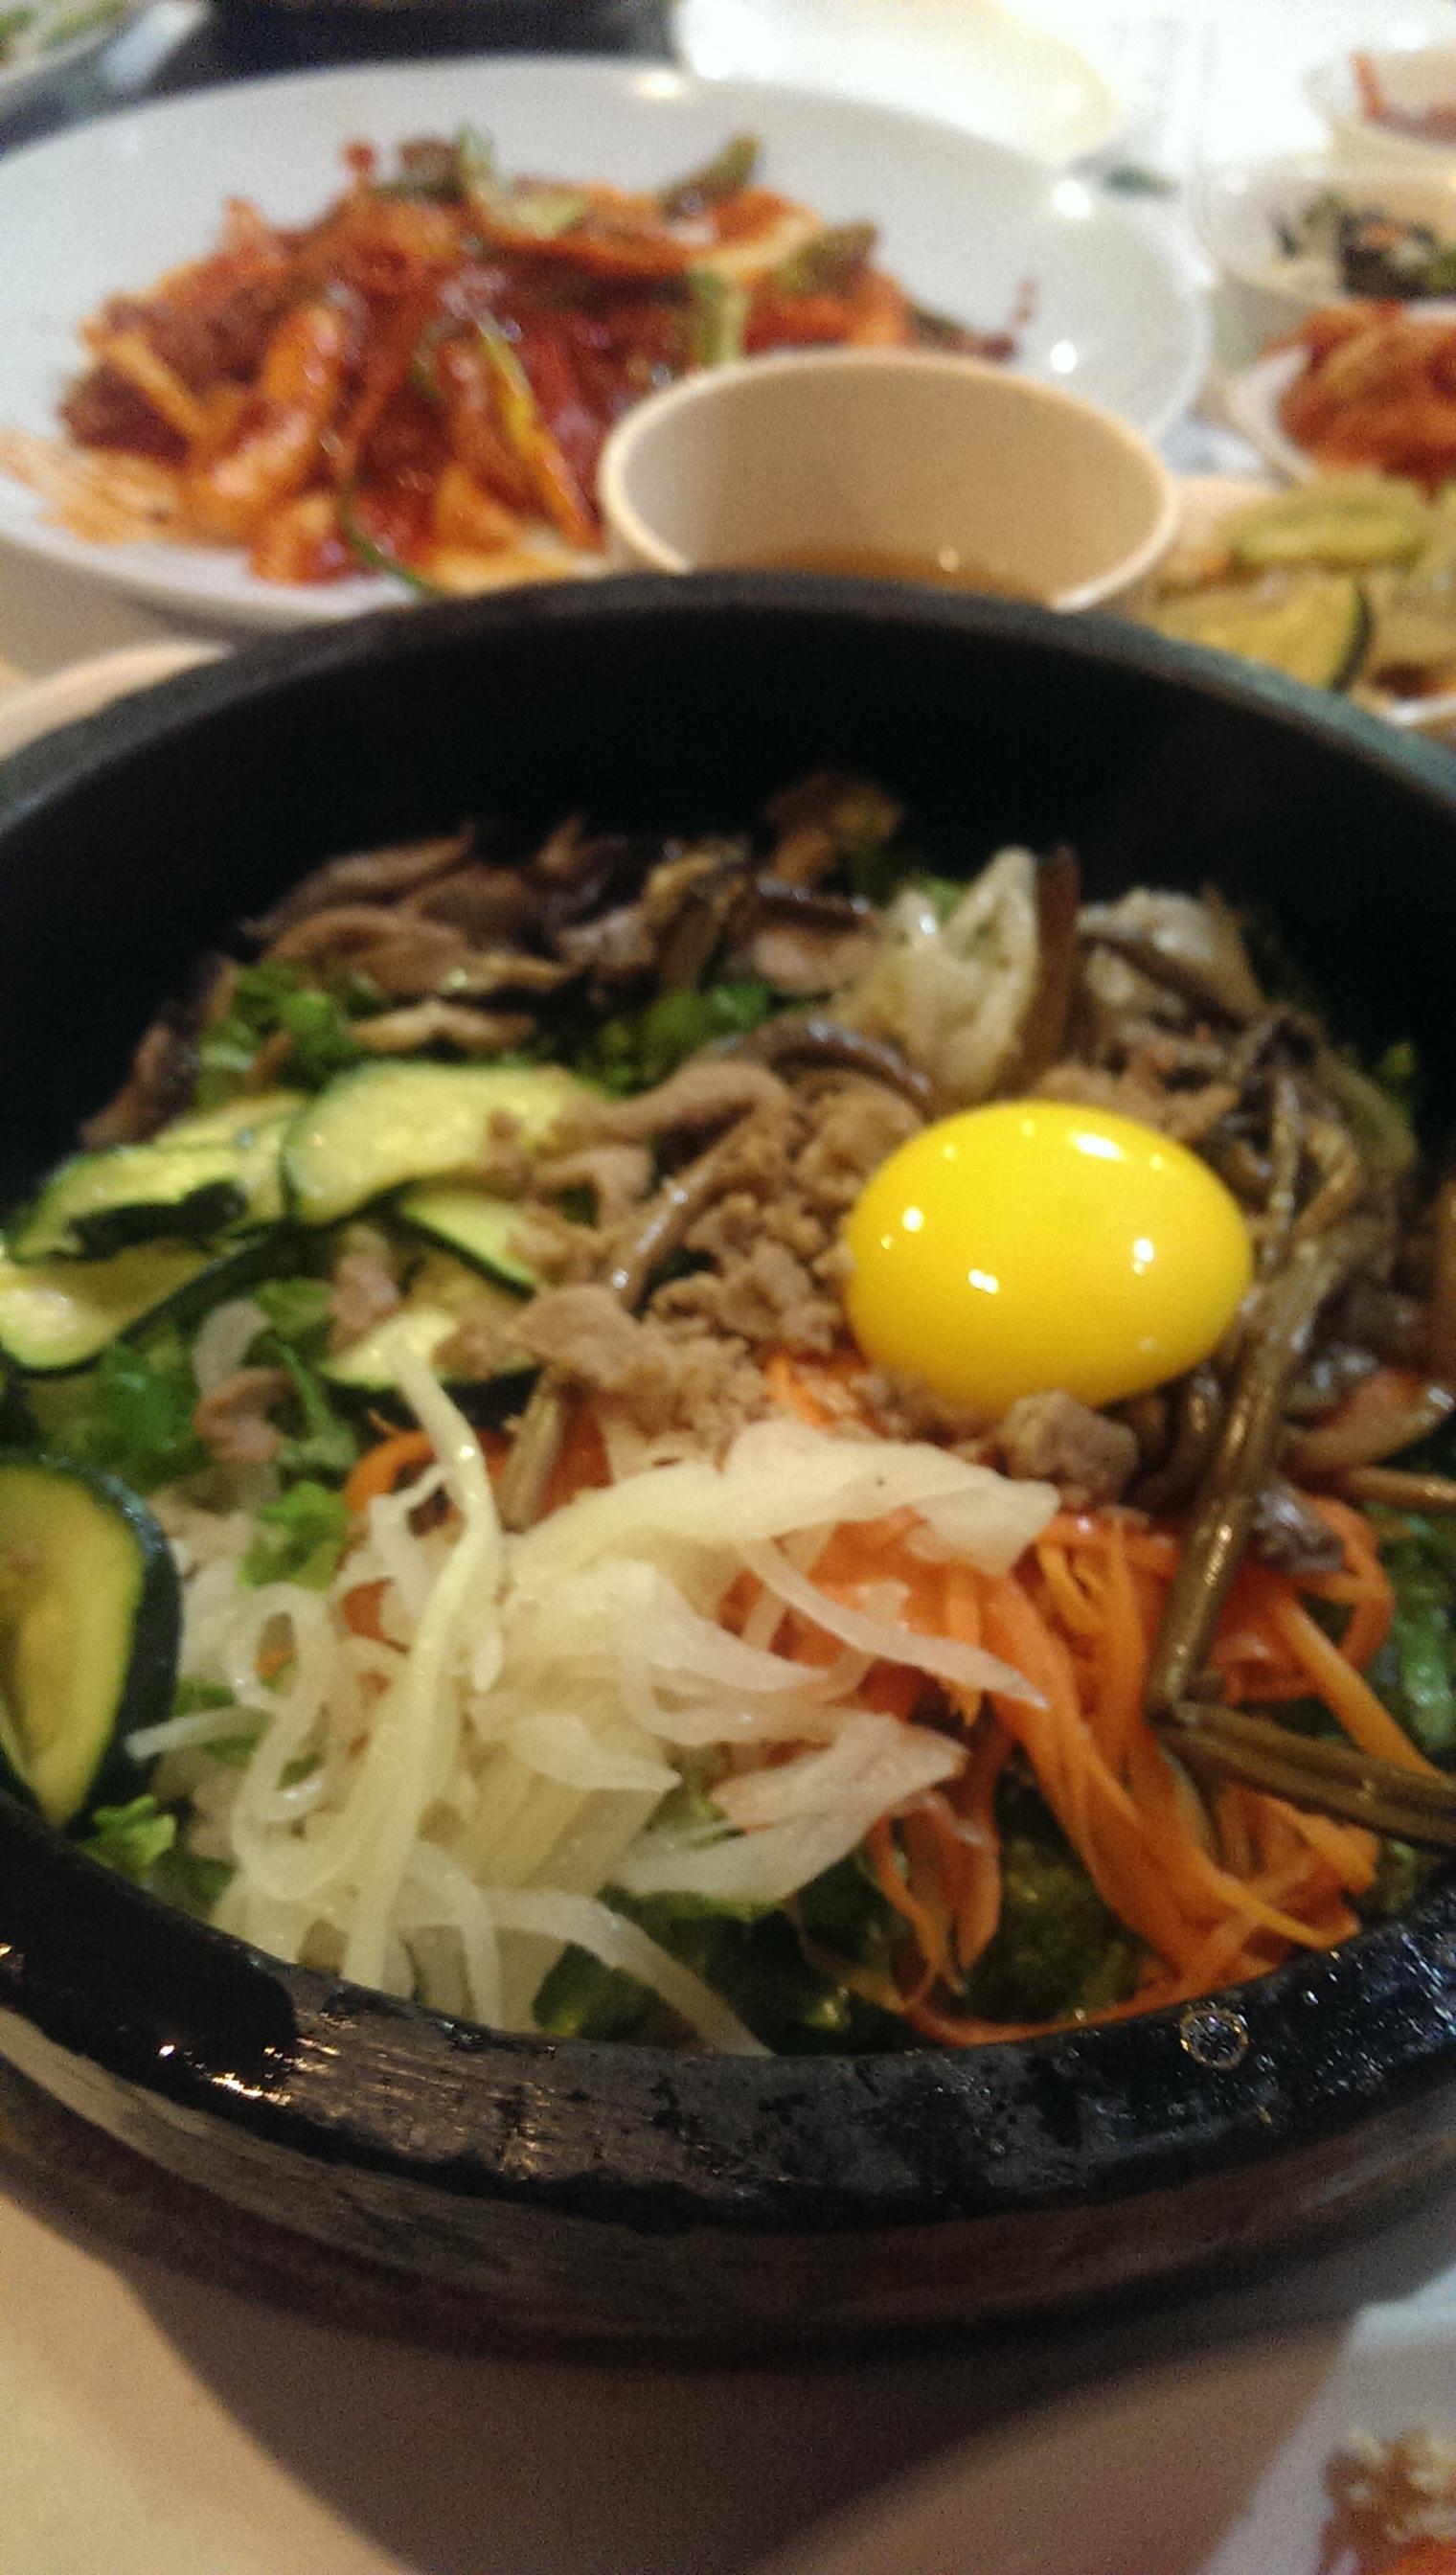 Seoul Garden in Parma | Cleveland Rocks, Cleveland Eats